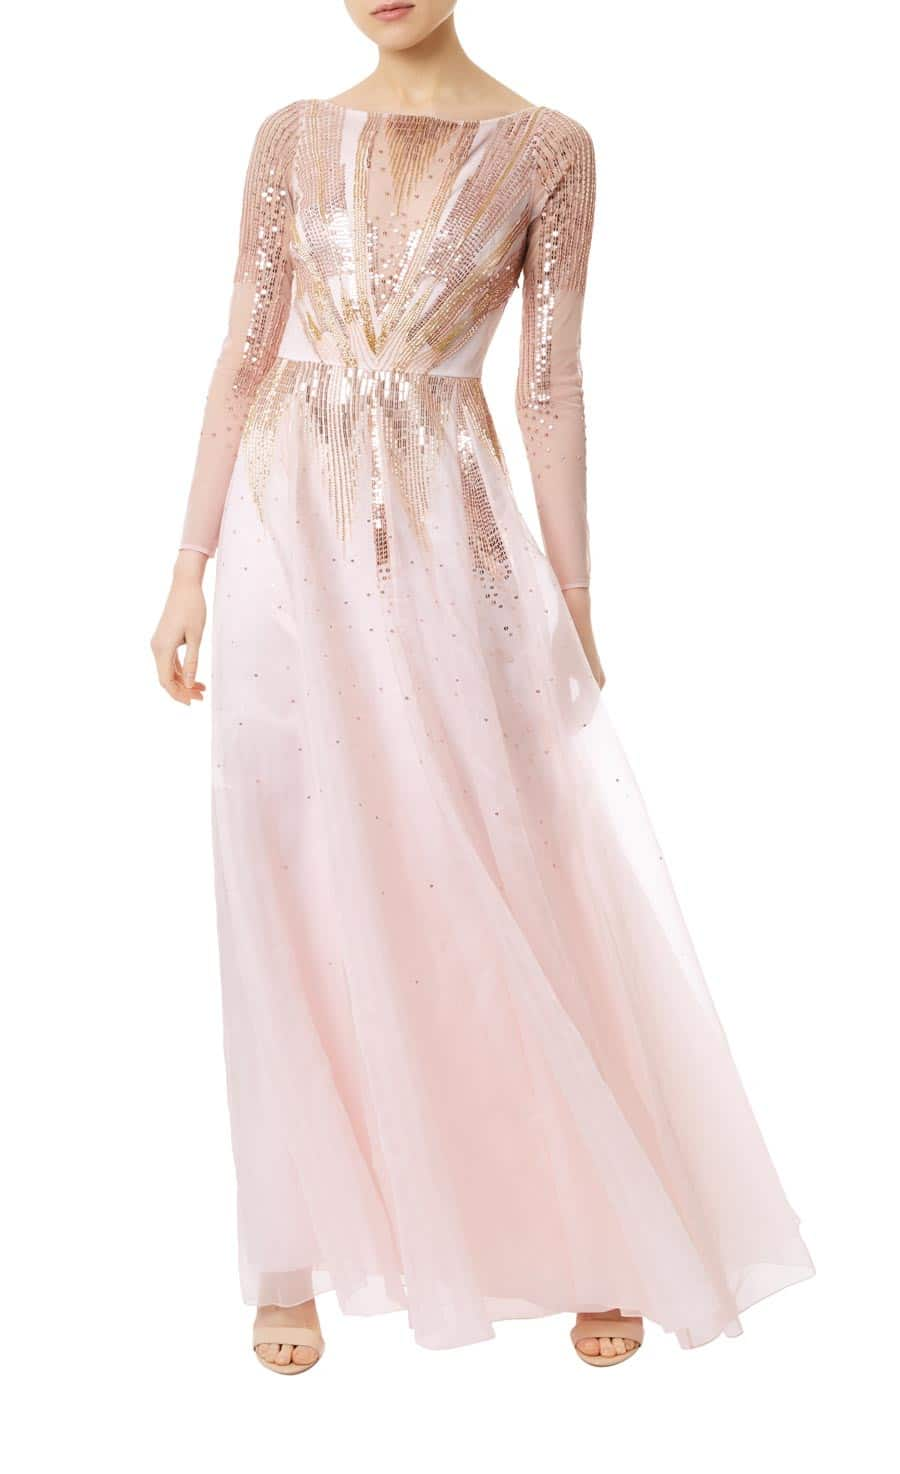 TEMPERLEYLONDON Mineral Long Pale Pink Dress